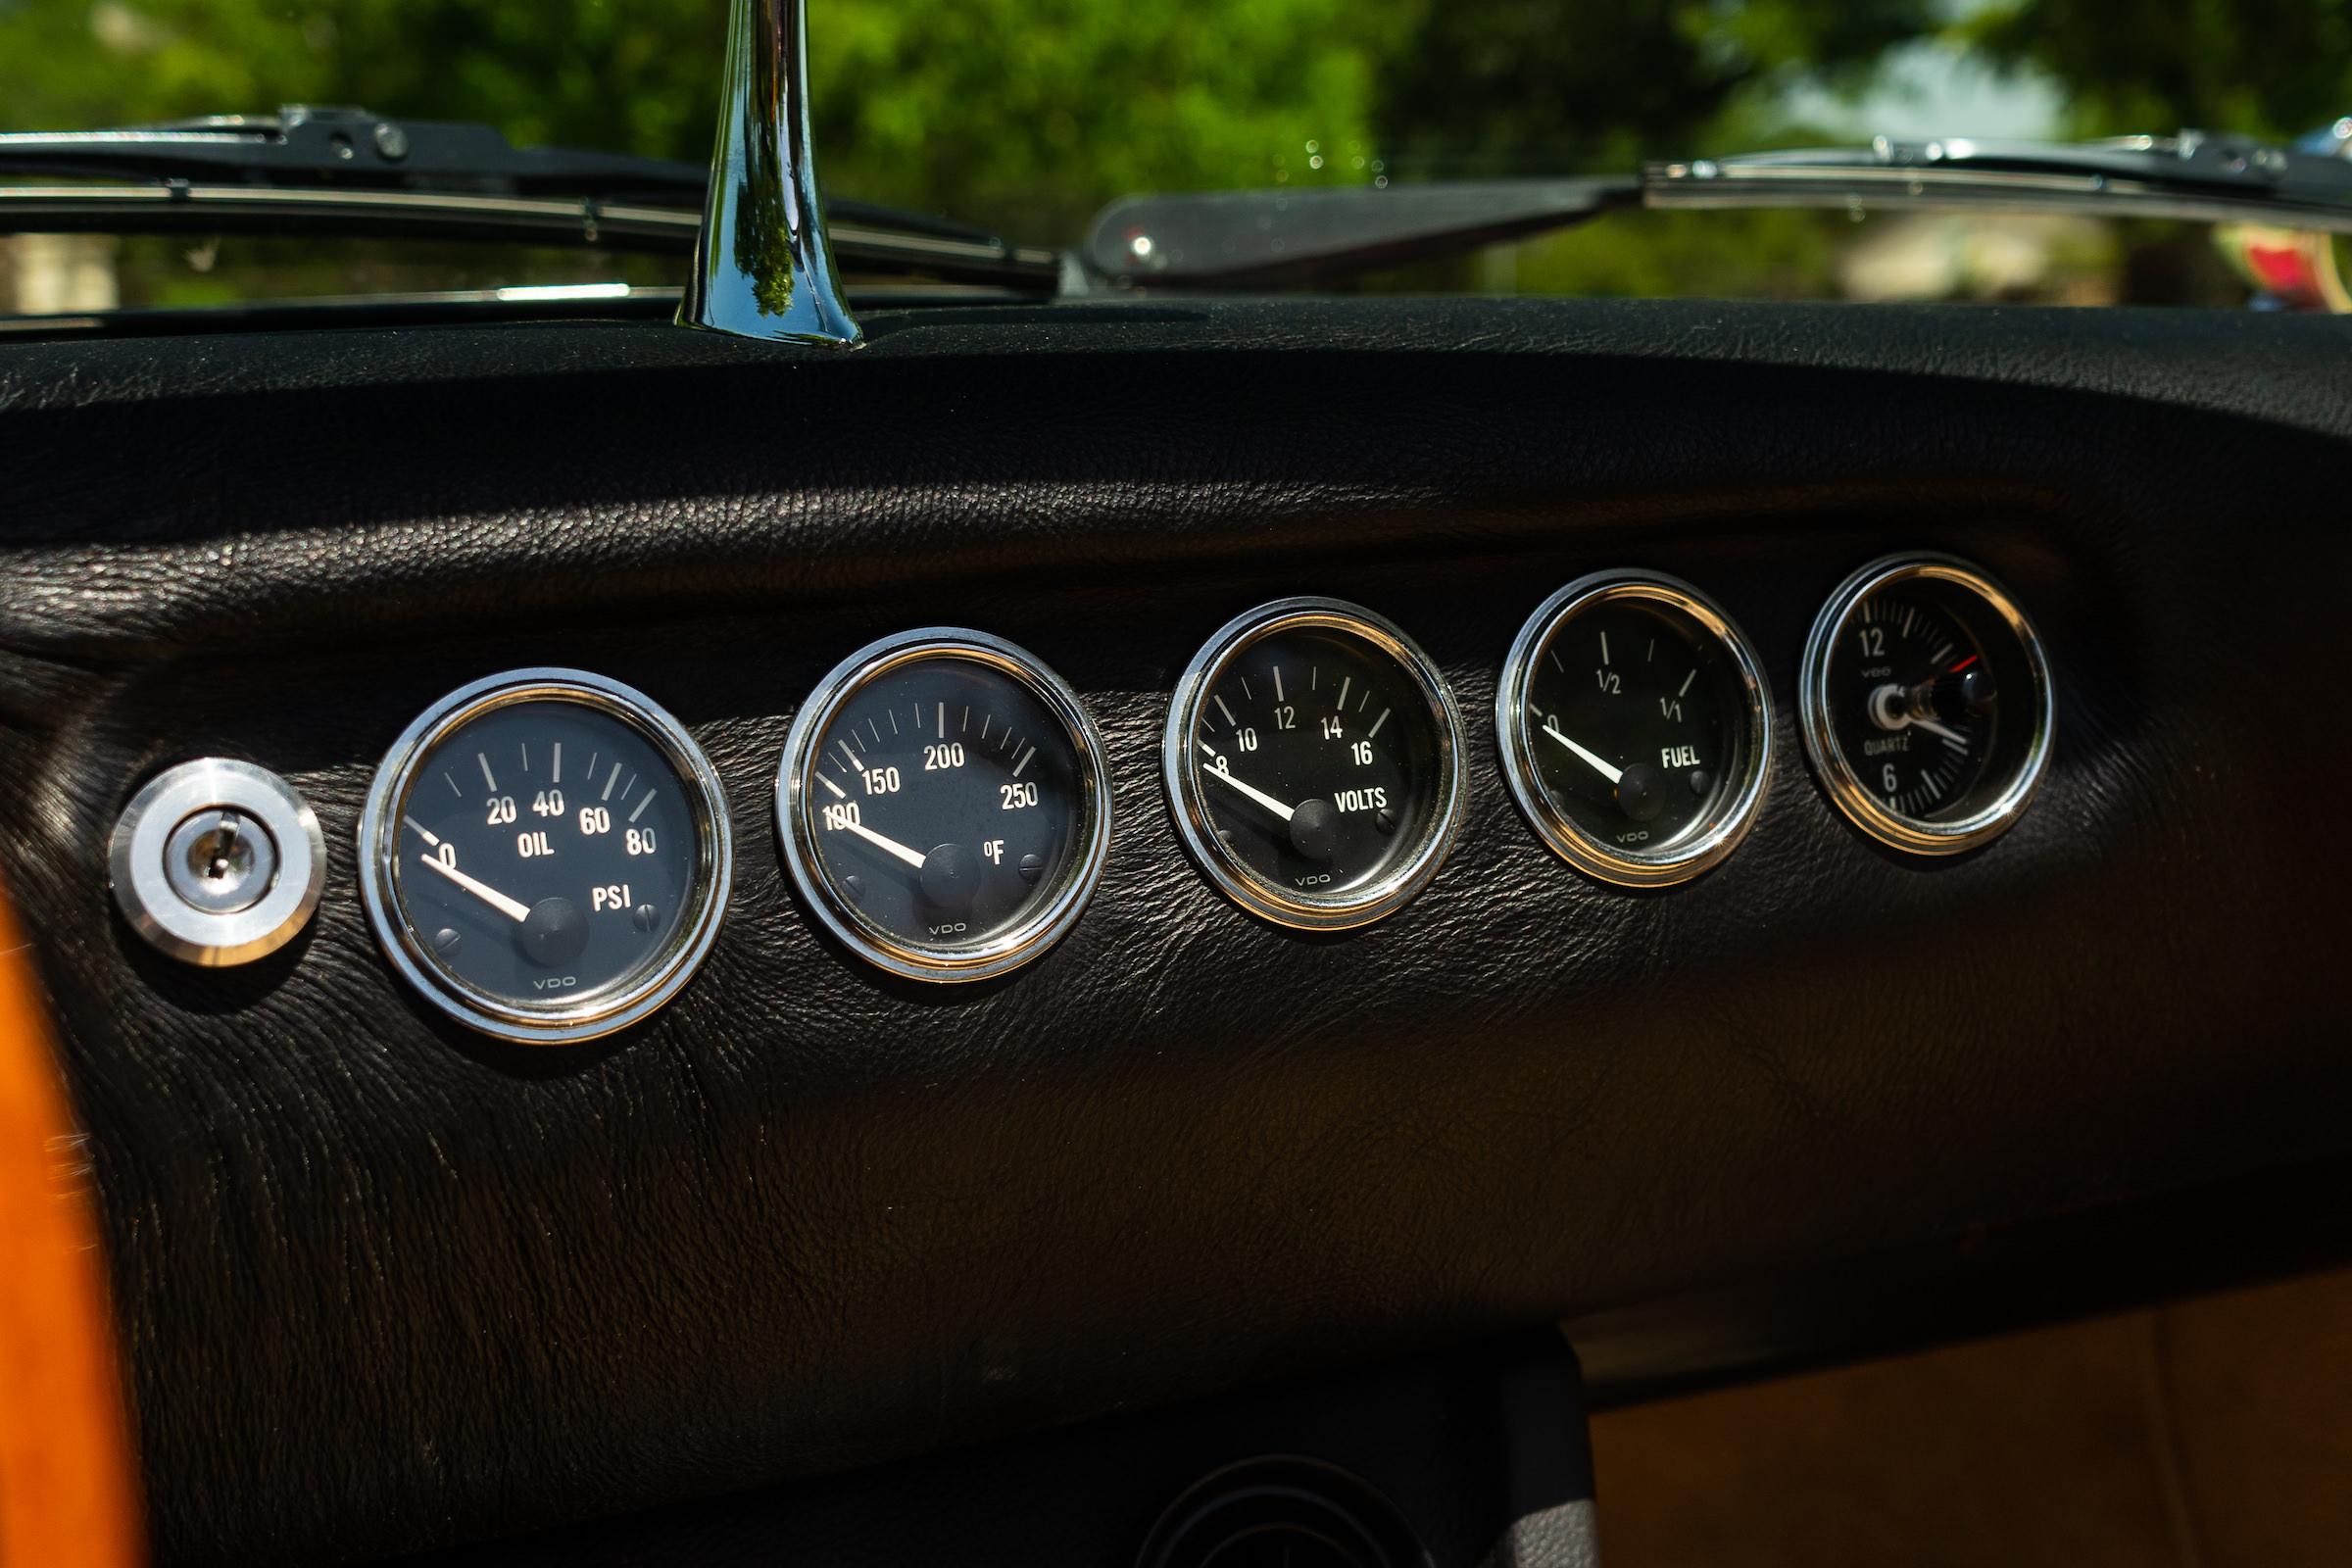 ferris buellers day off car